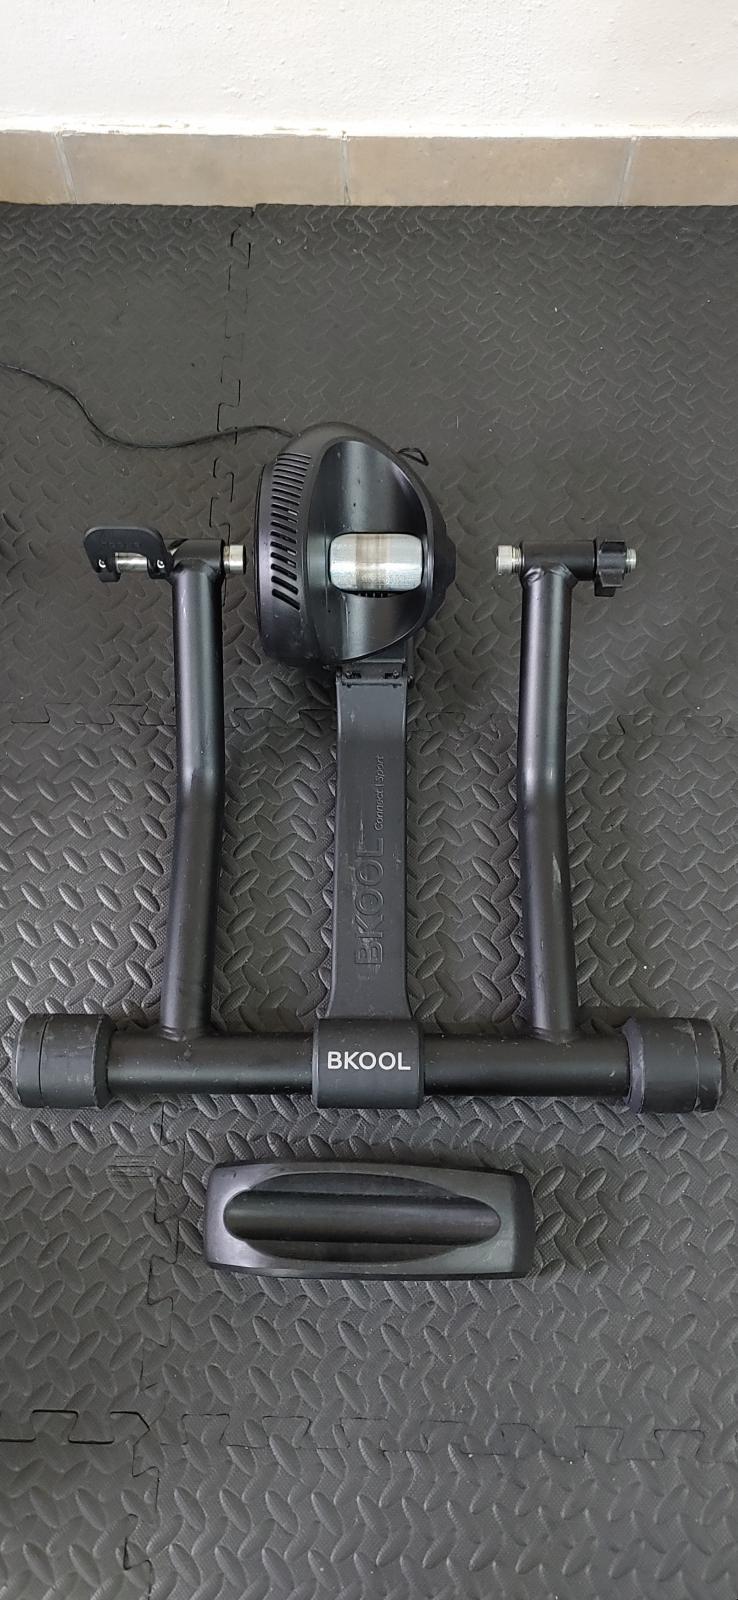 bkool-smart-pro-trainer-1606280765-39